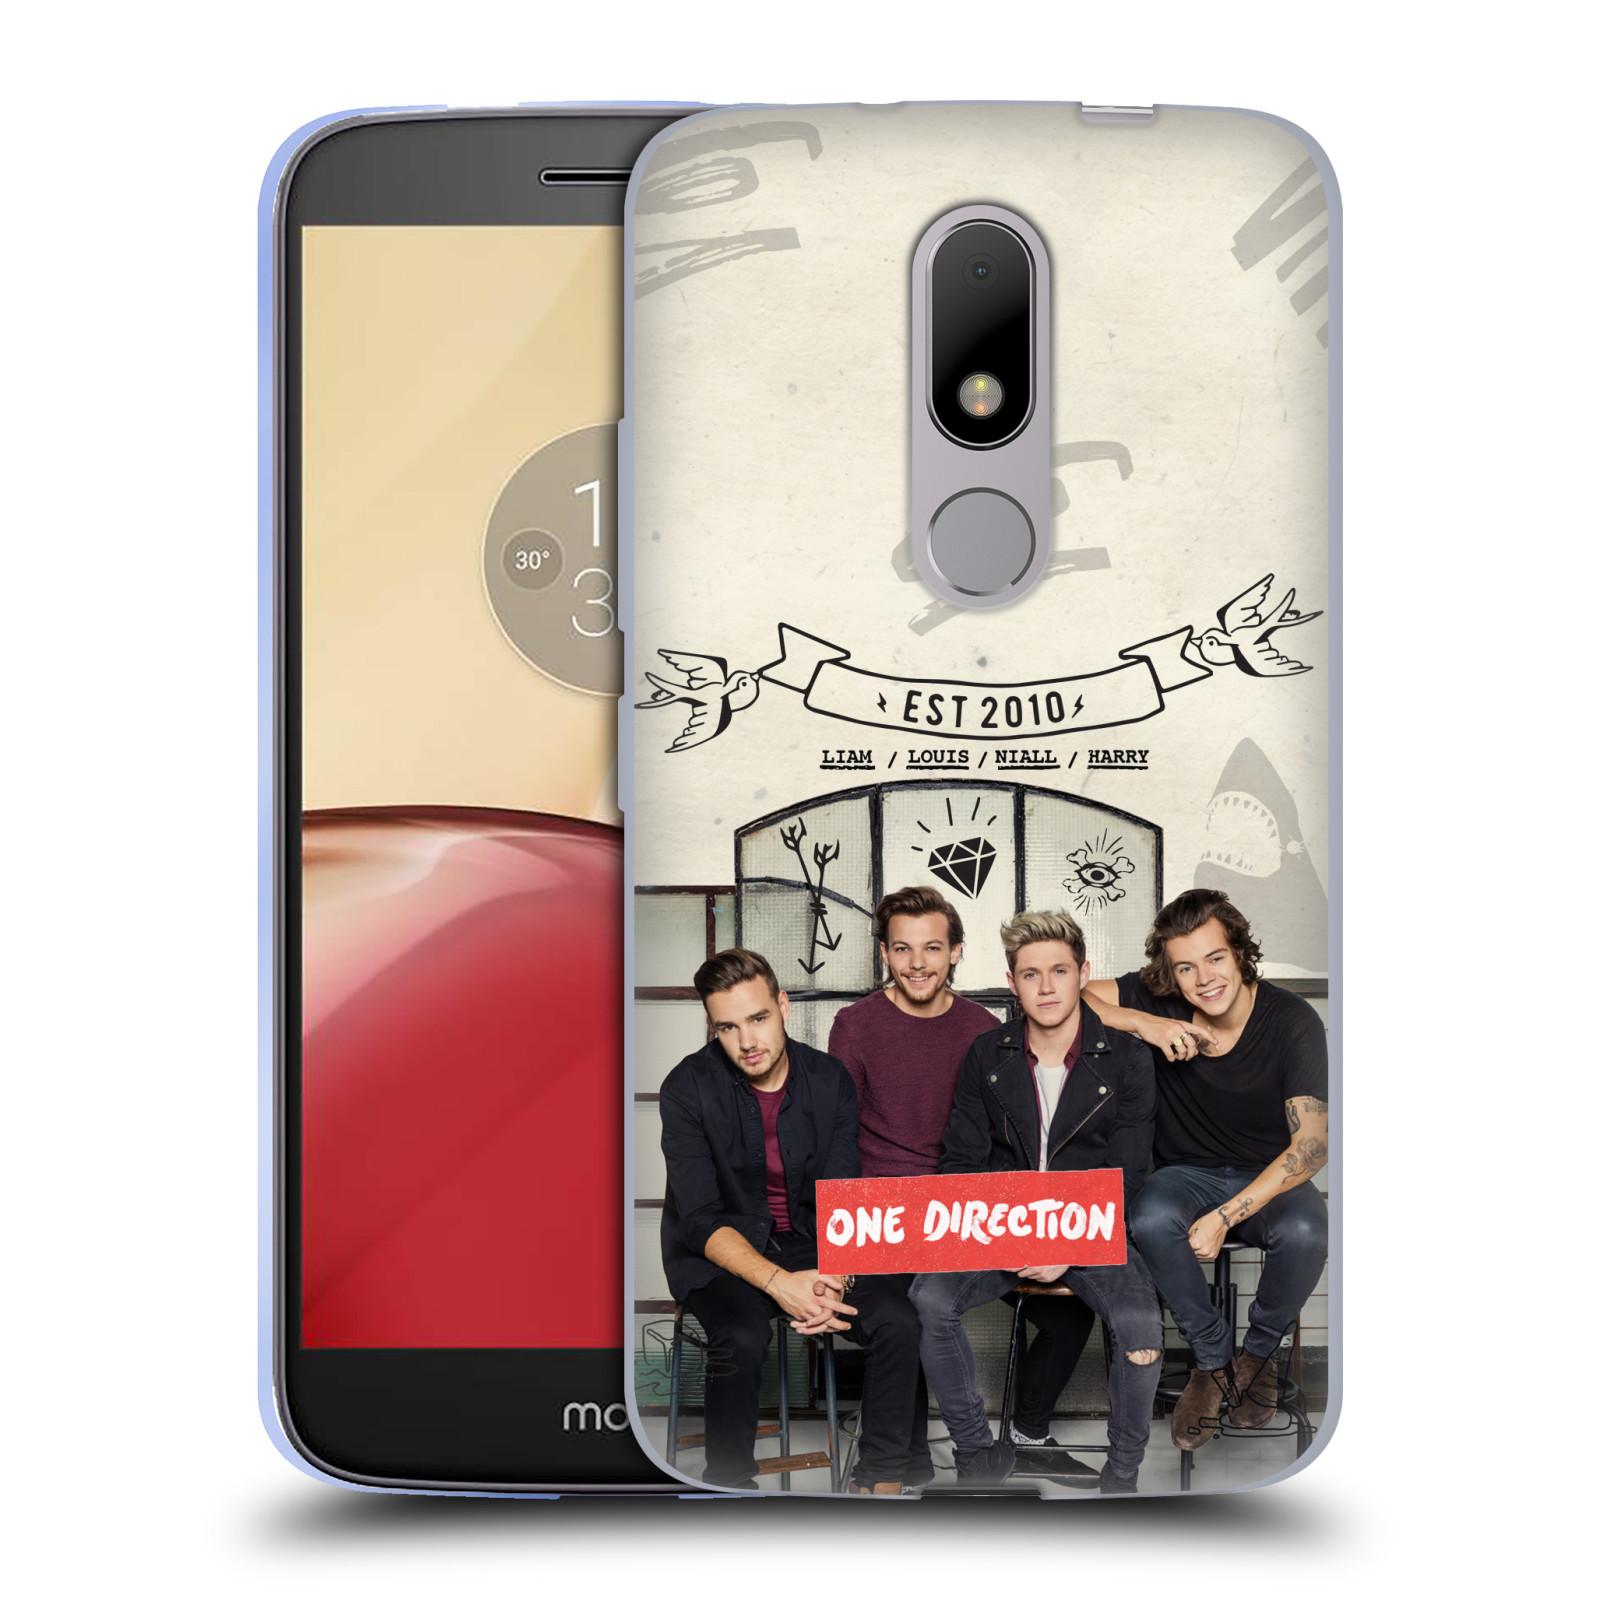 Silikonové pouzdro na mobil Lenovo Moto M - Head Case One Direction - EST 2010 (Silikonový kryt či obal One Direction Official na mobilní telefon Lenovo Moto M (Dual Sim))